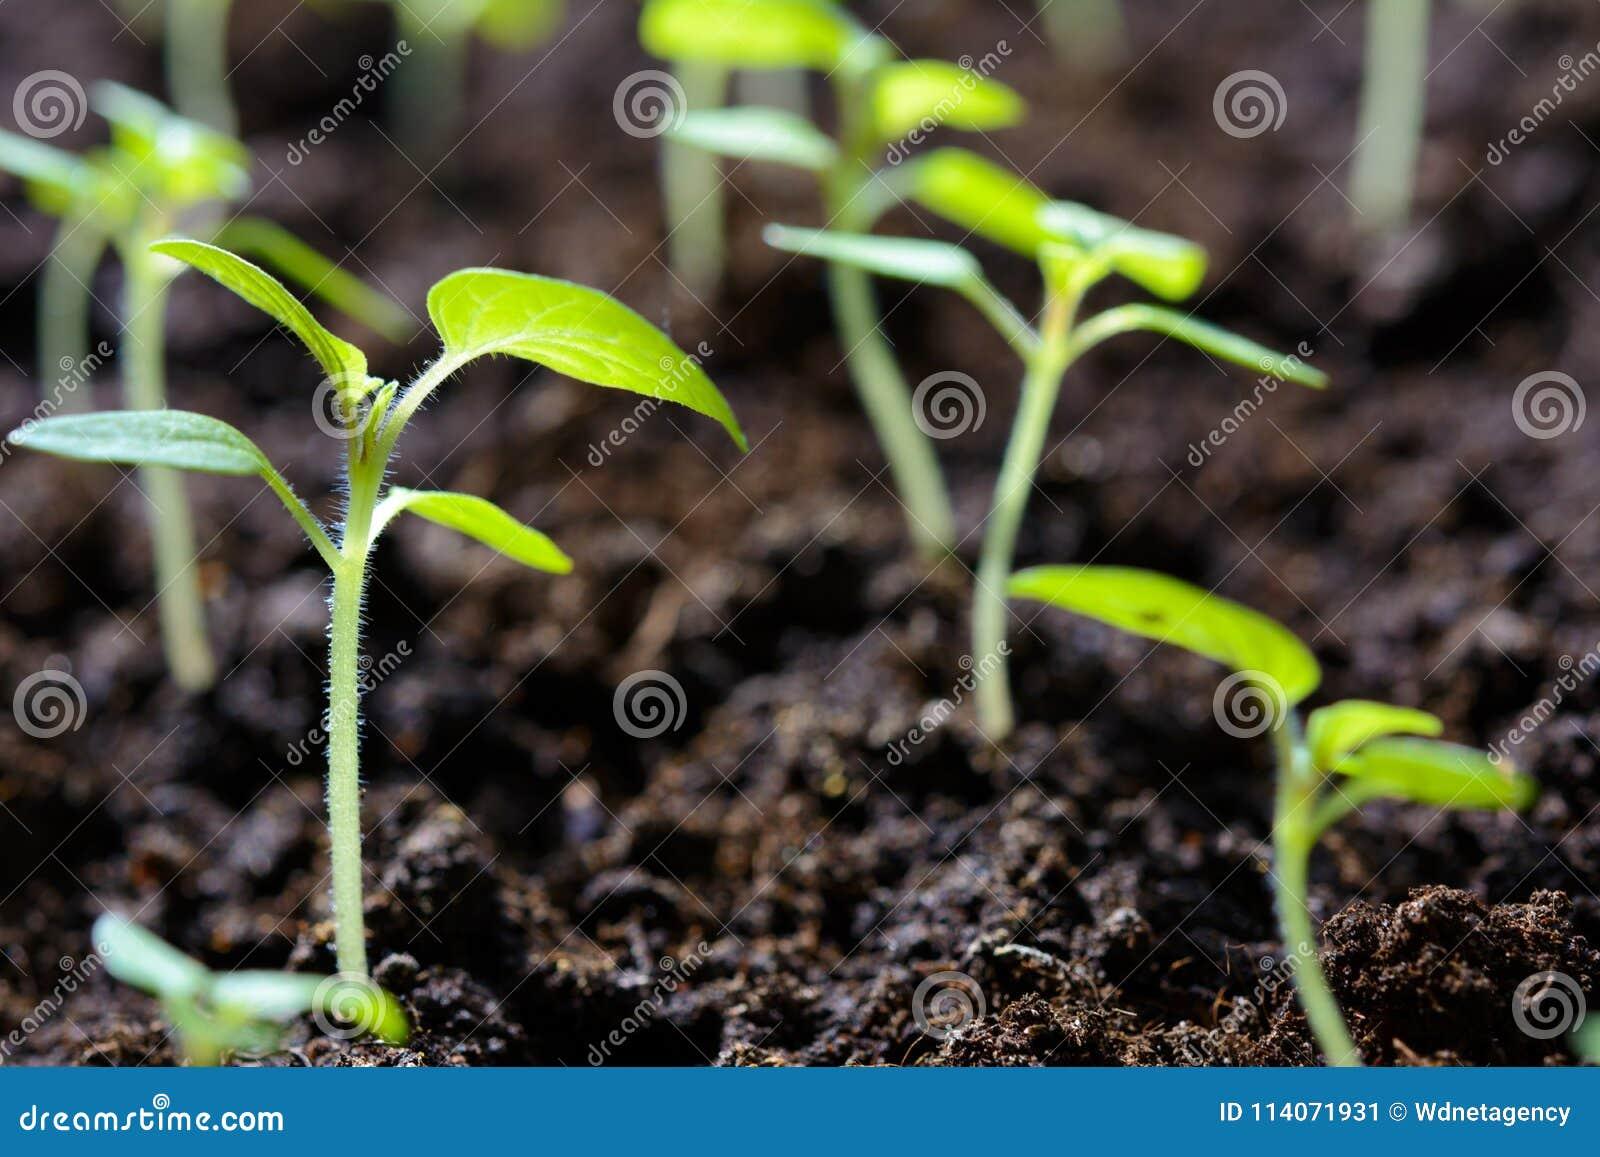 Seedlings of young plants